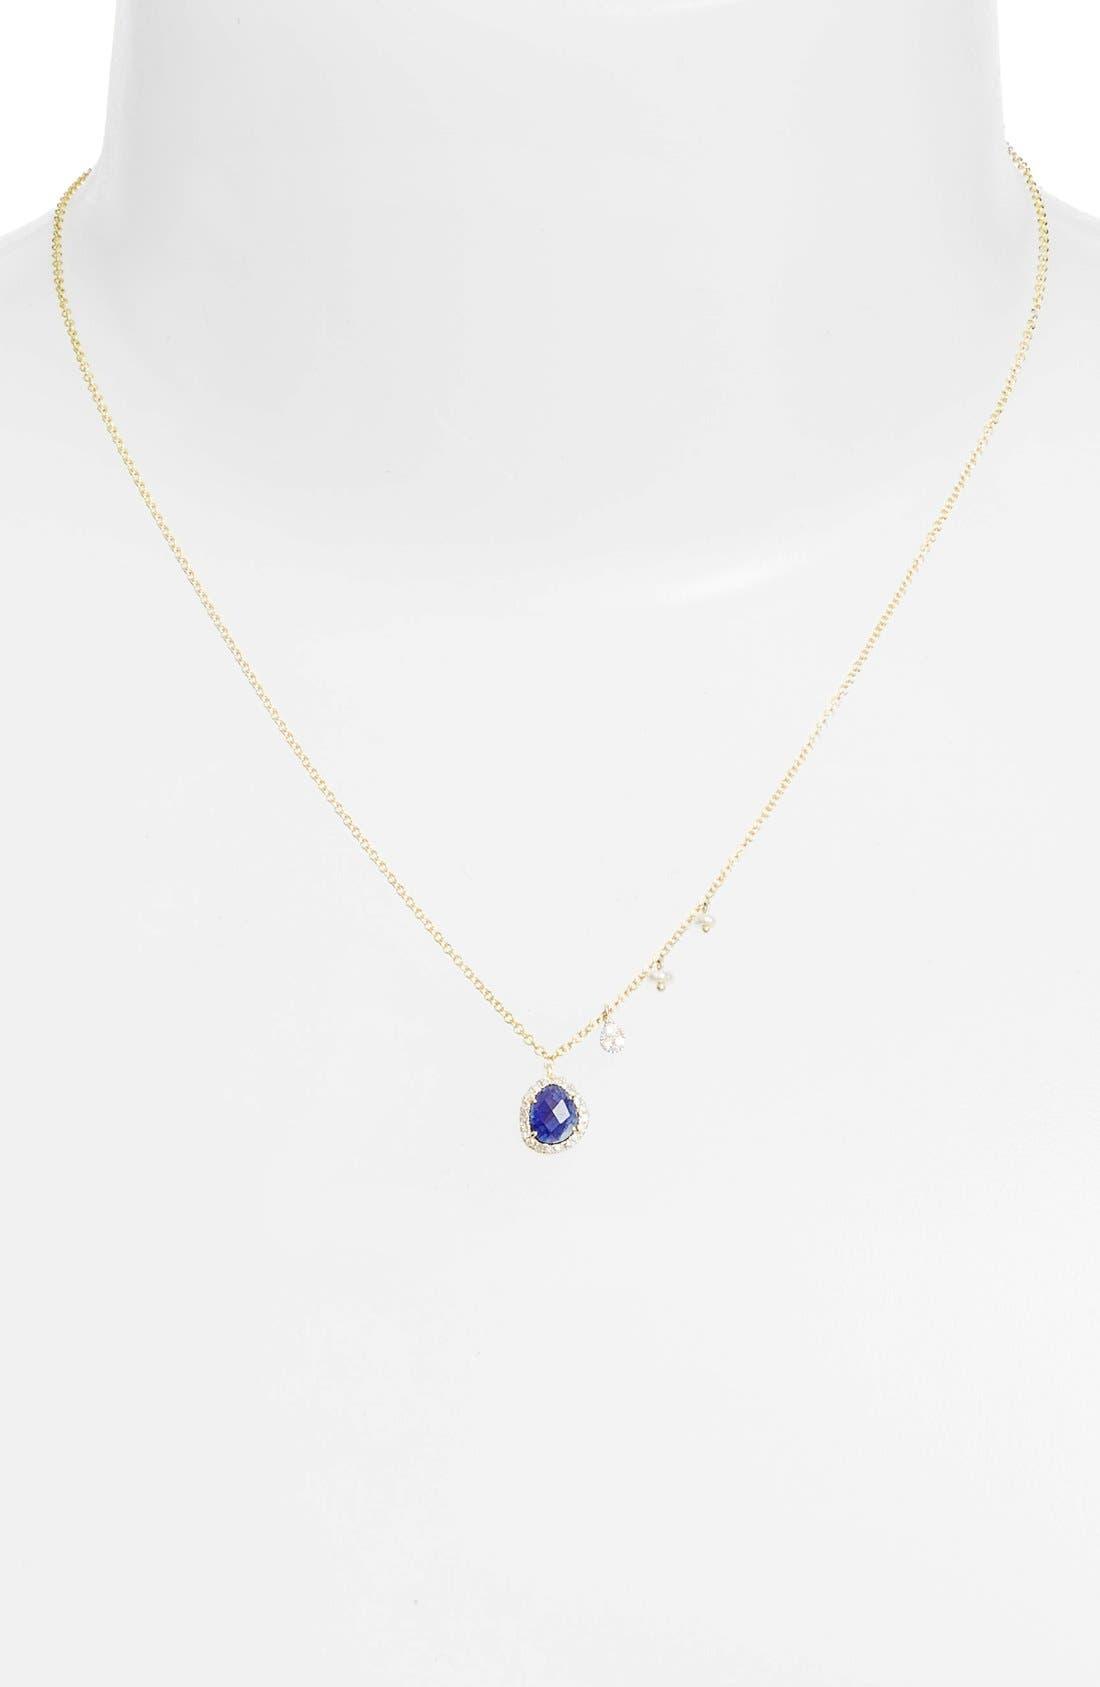 Mini Stone Diamond Pendant Necklace,                             Alternate thumbnail 5, color,                             YELLOW GOLD/ BLUE SAPPHIRE